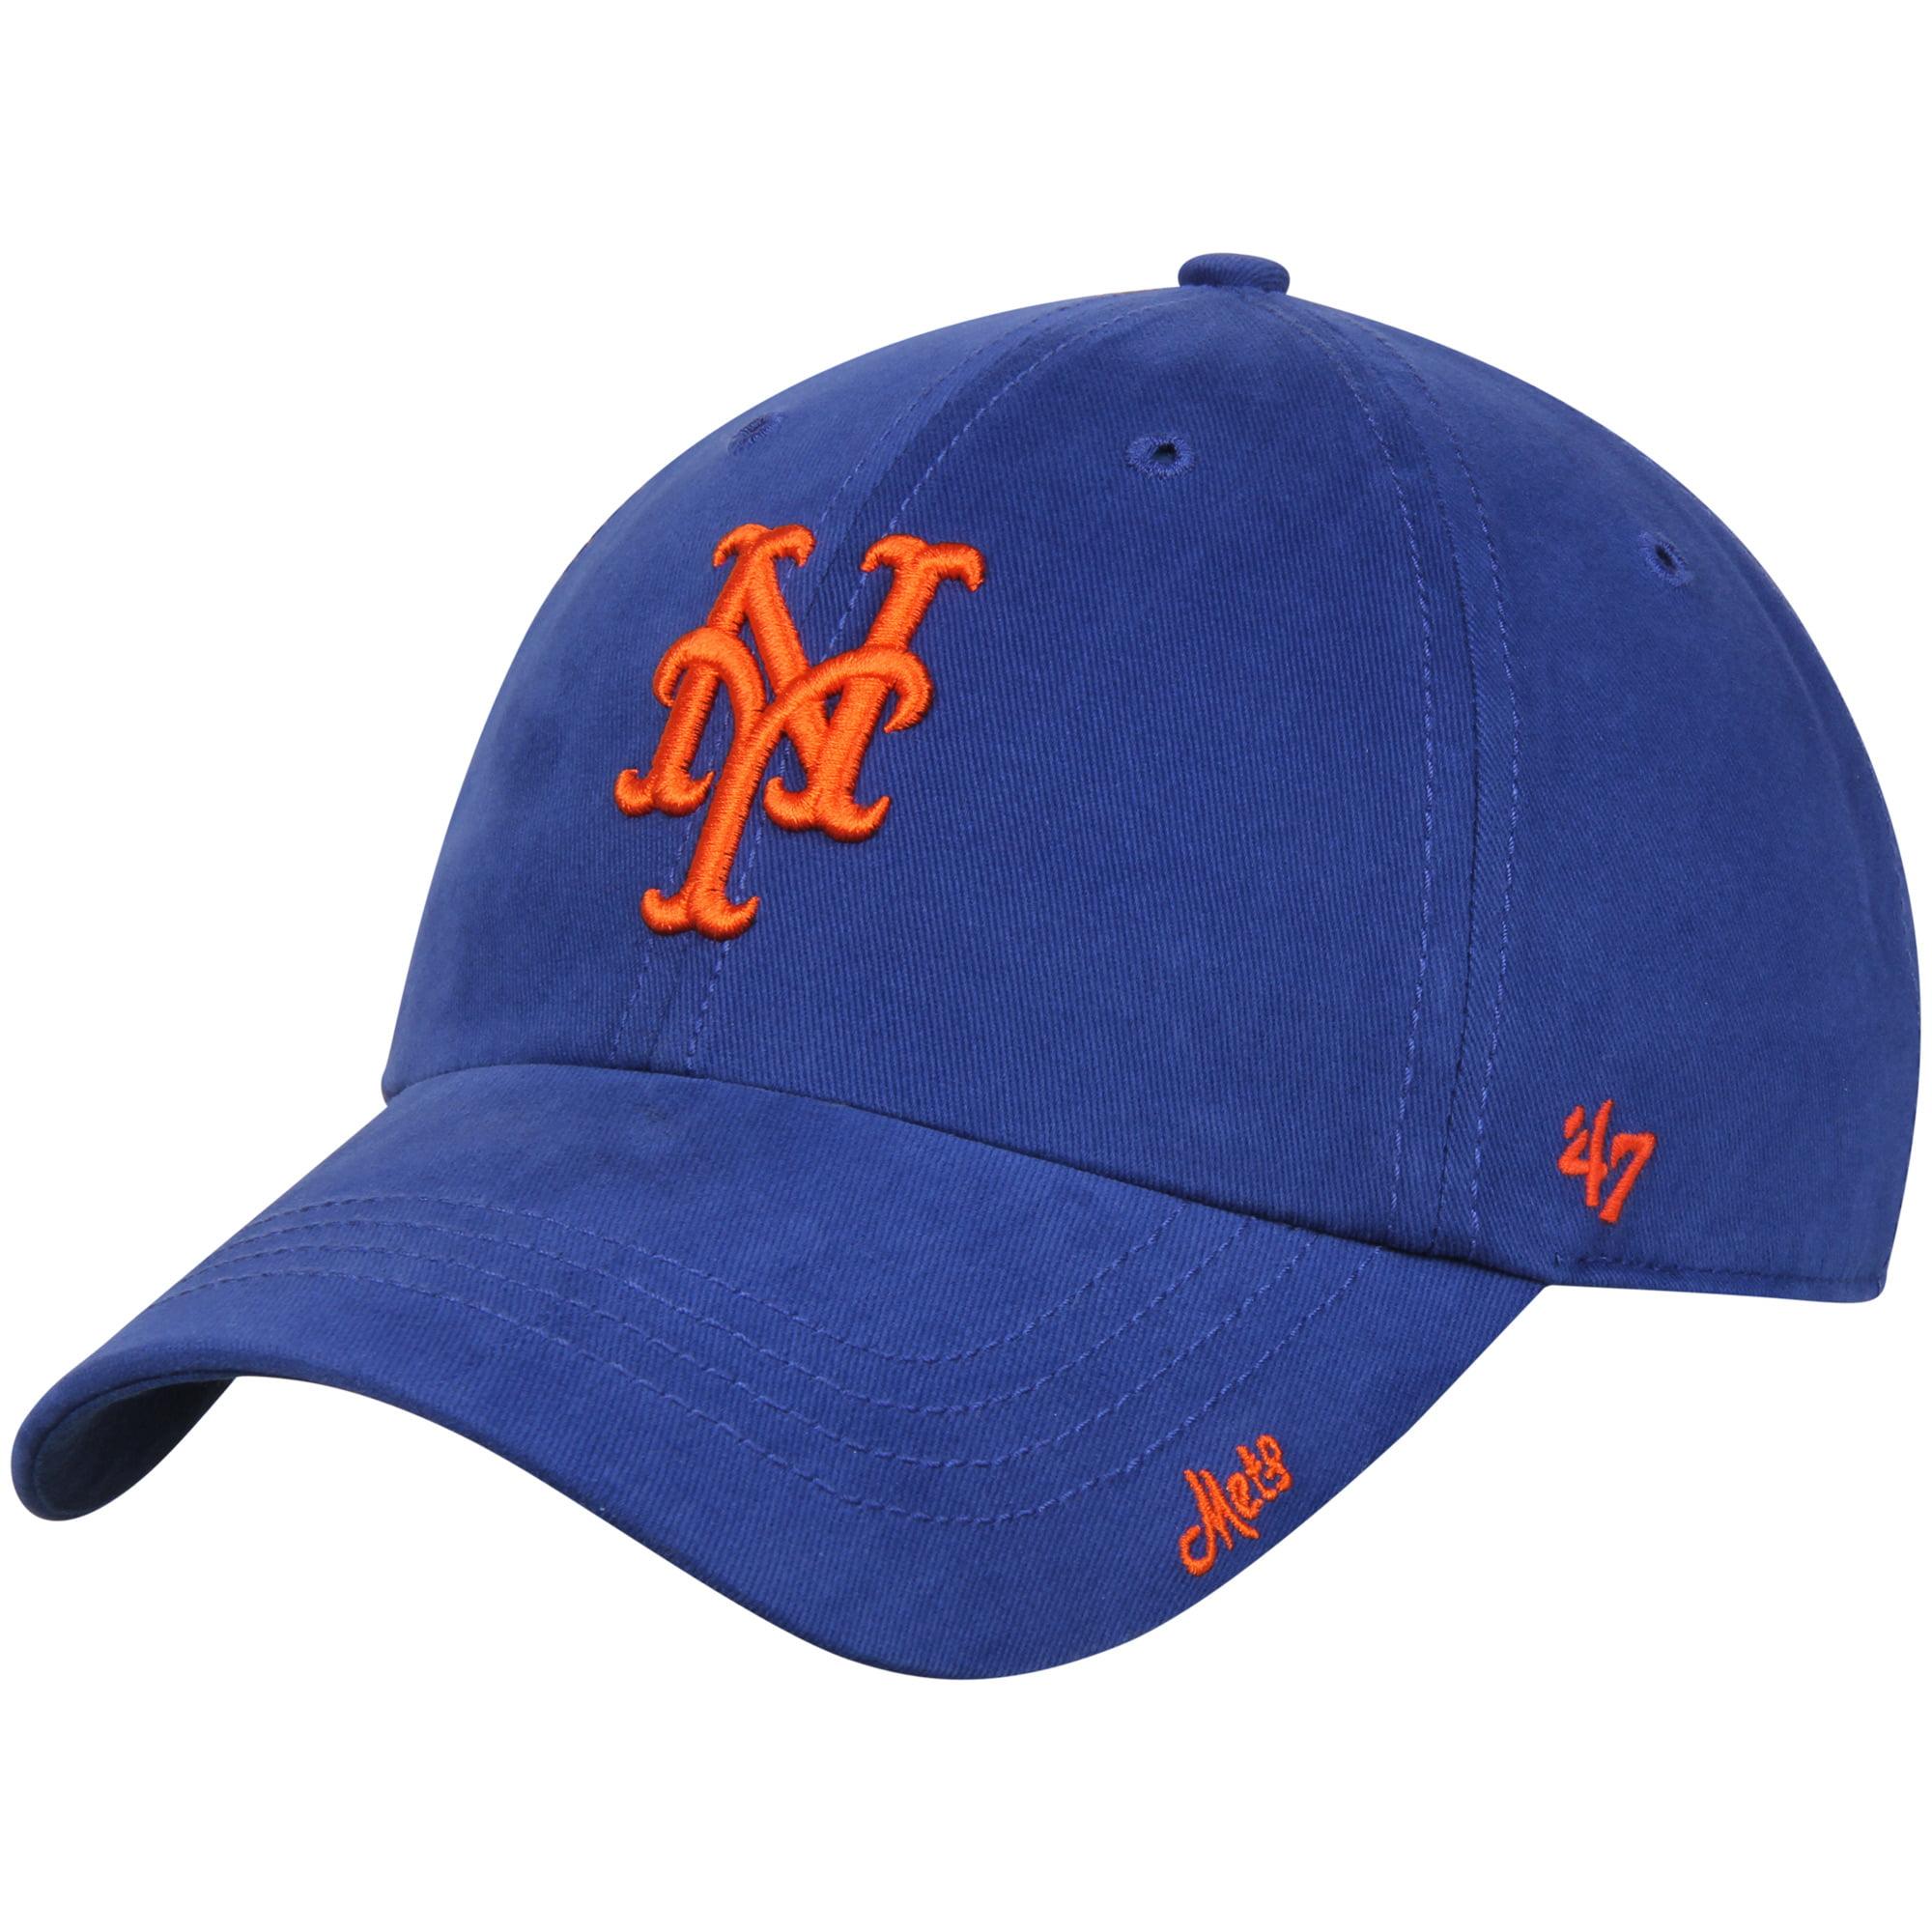 New York Mets '47 Women's Miata Clean Up Adjustable Hat - Royal/Orange - OSFA